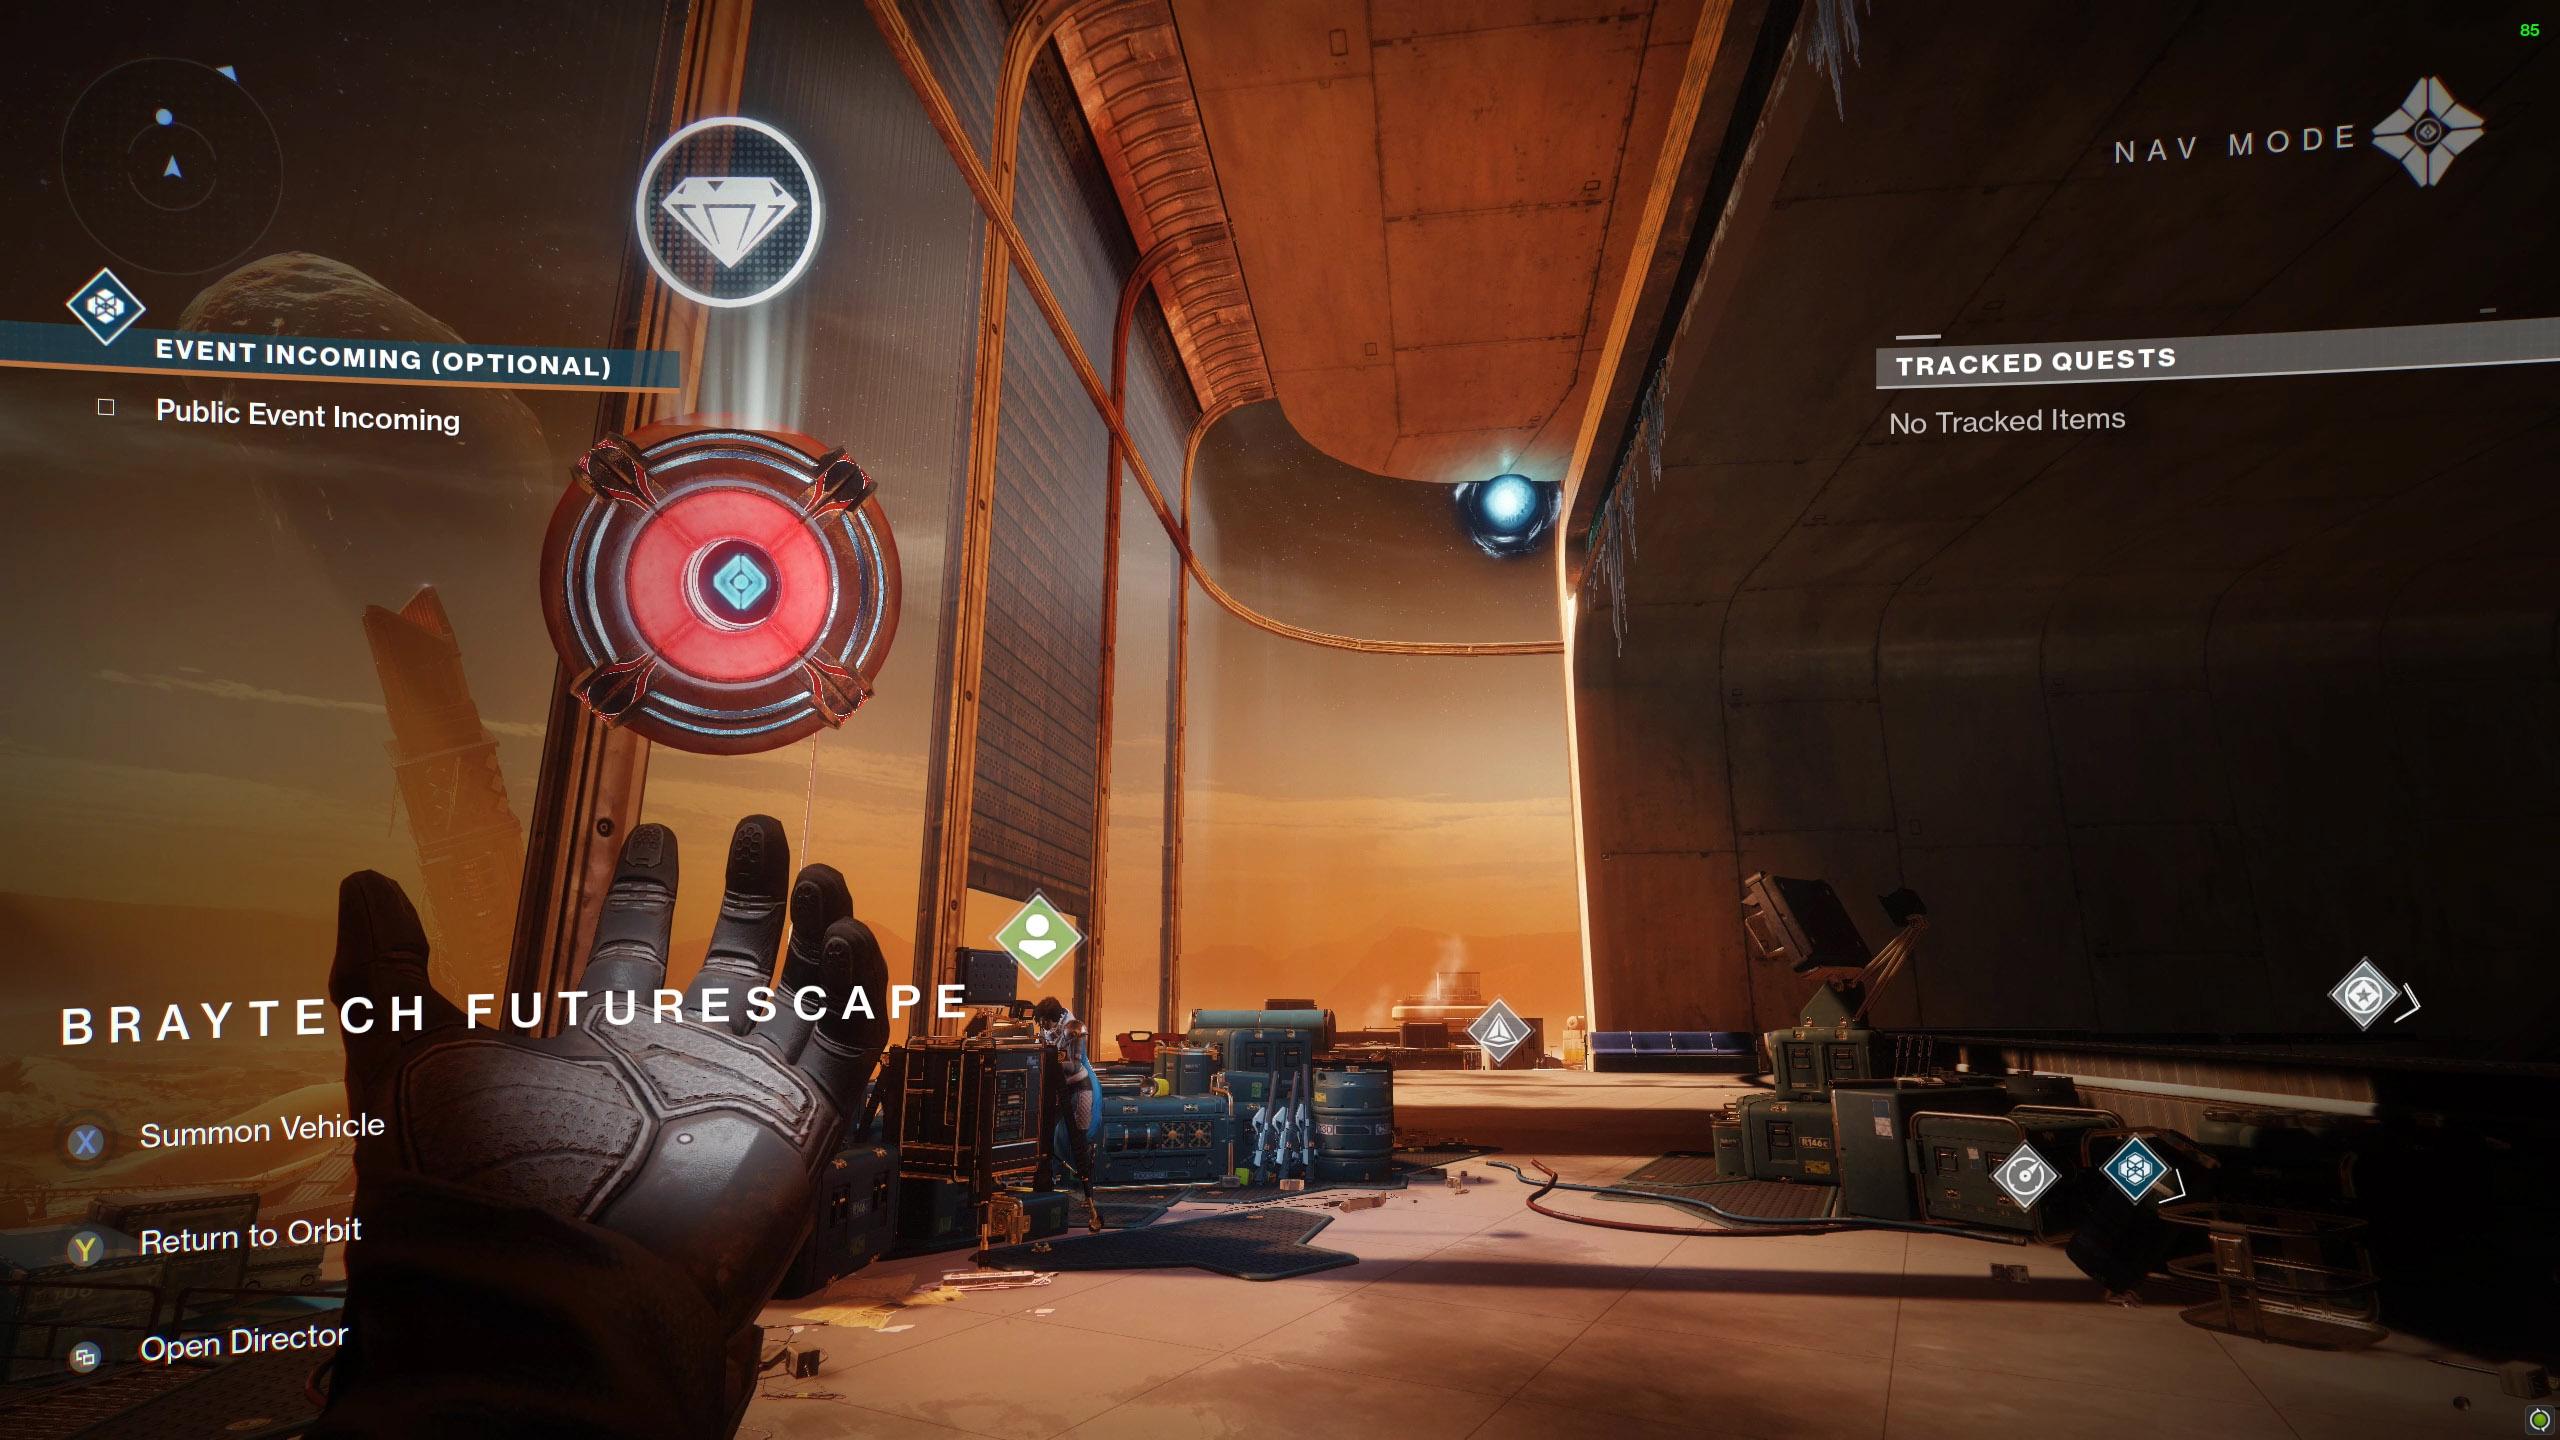 Destiny 2 Savathuns Eyes Mars Braytech Futurescape 2